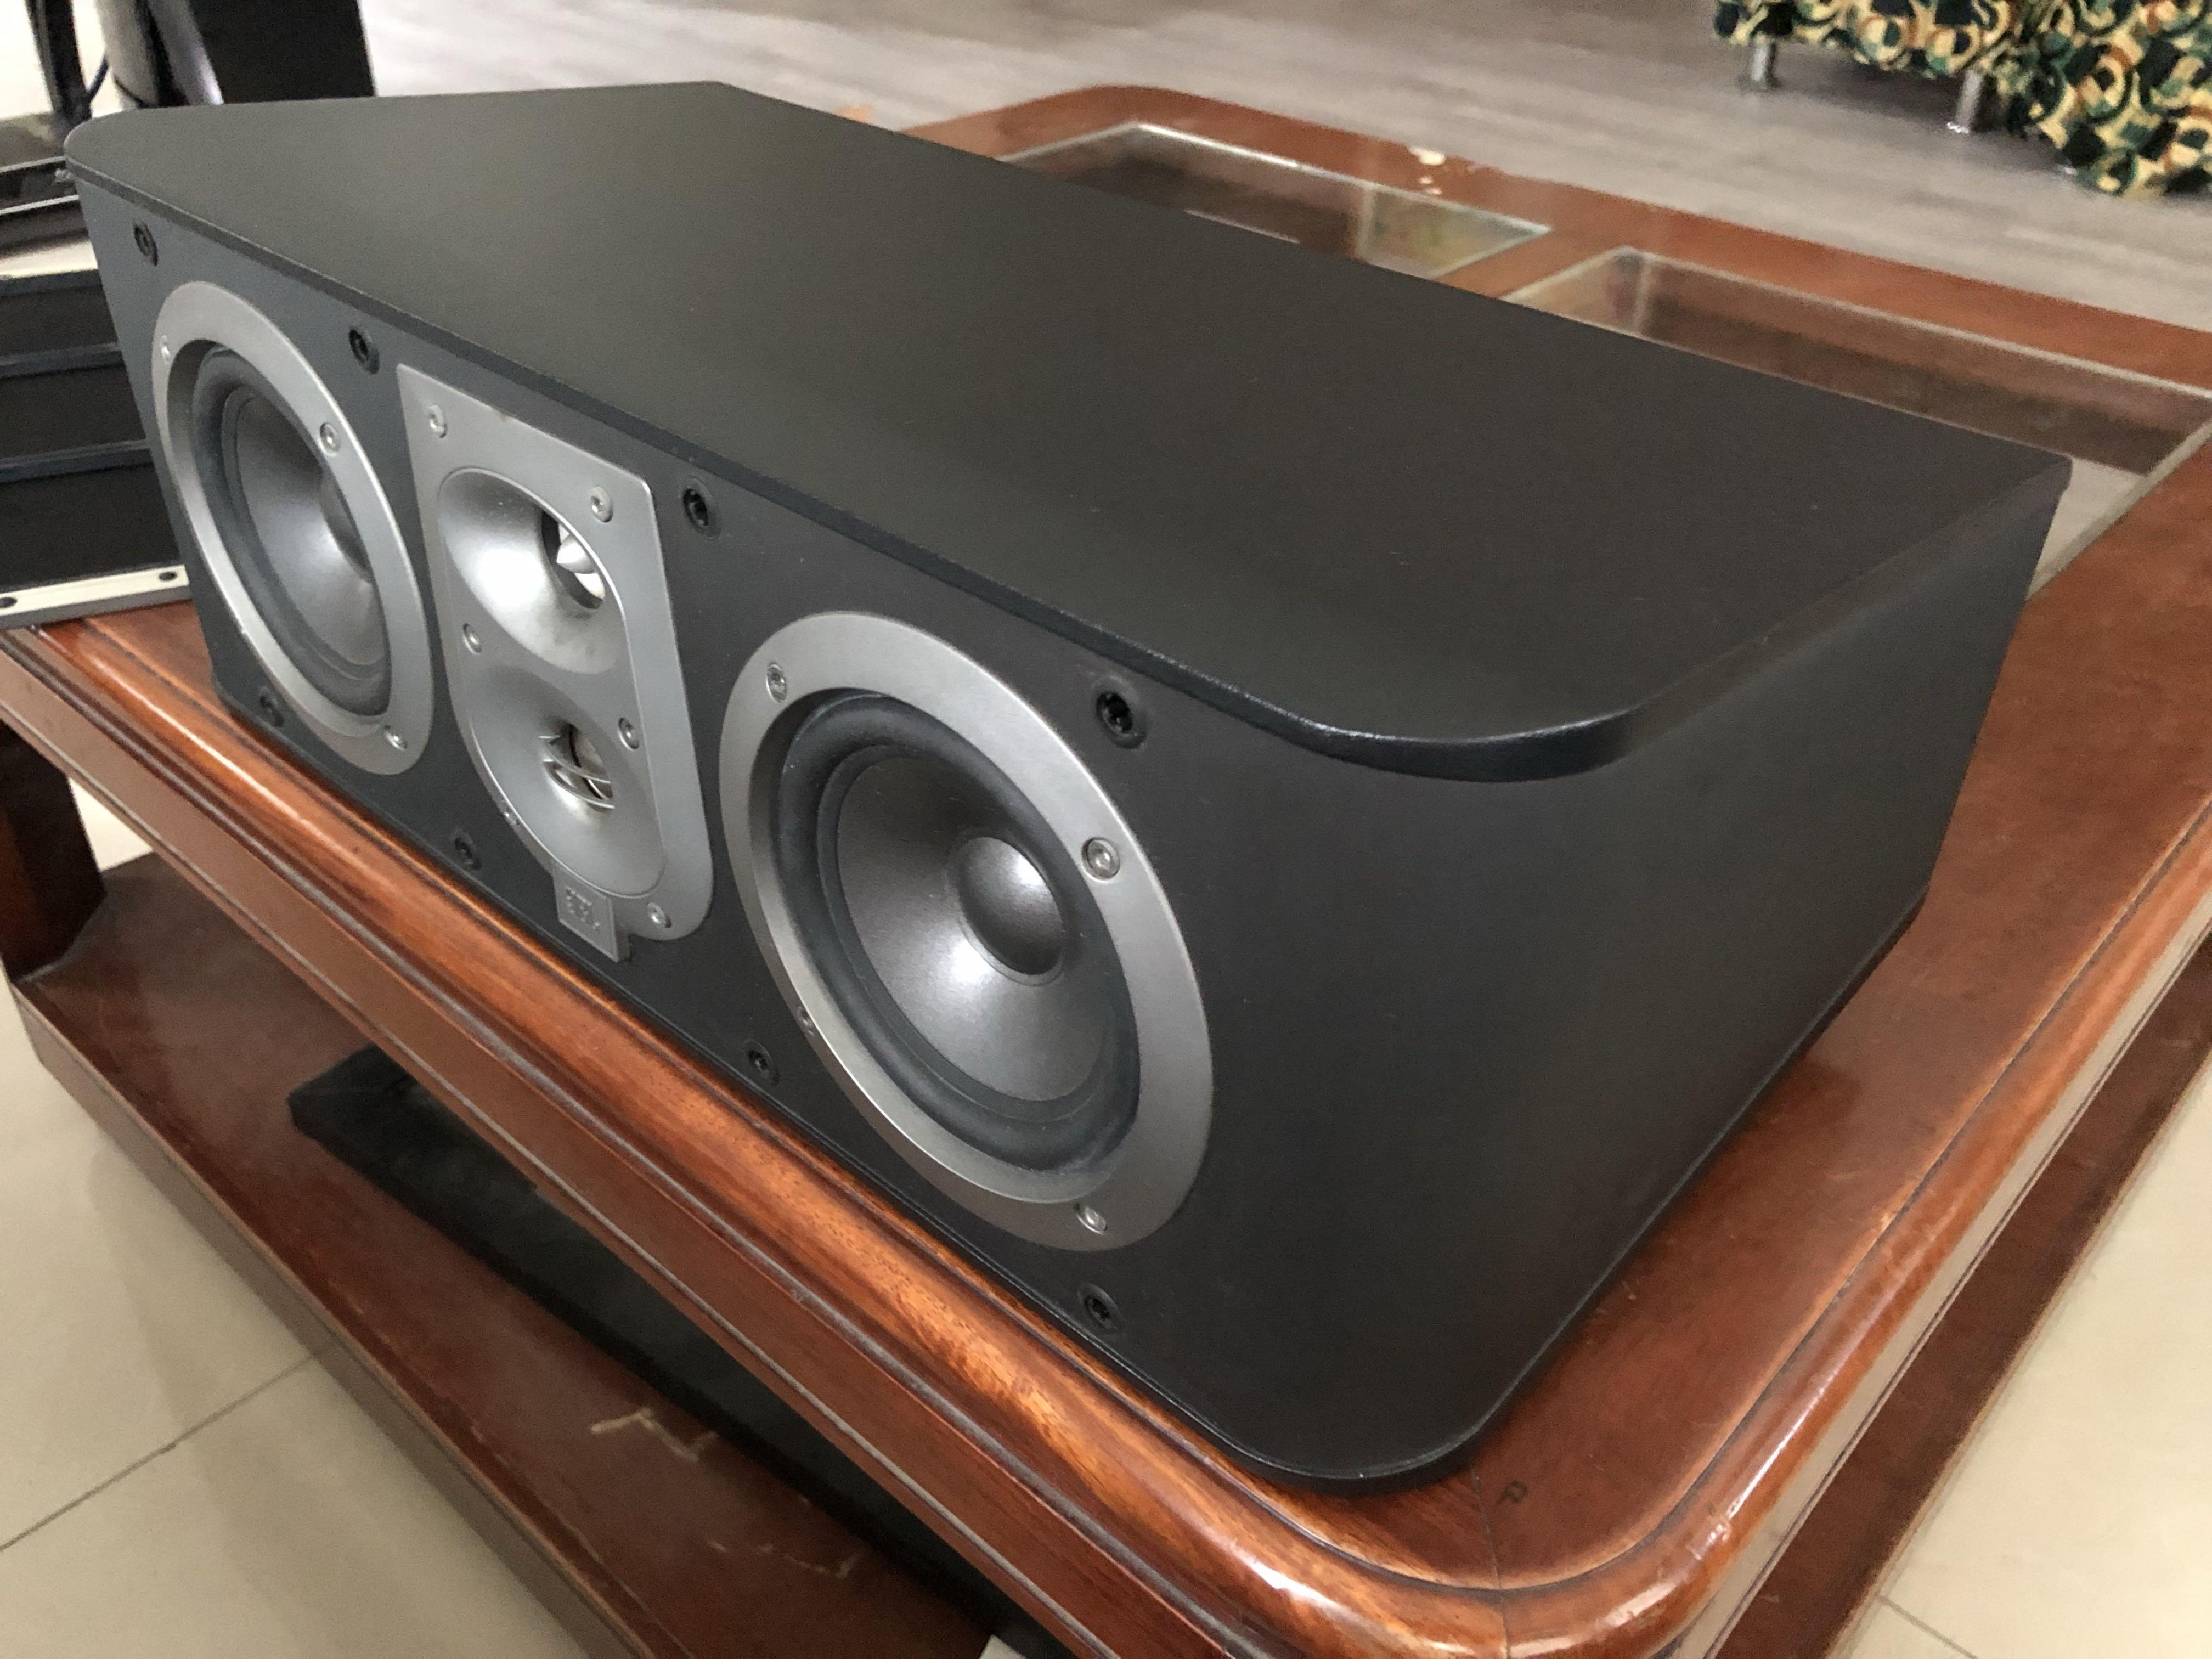 JBL Center Speaker (not klipsch jbl wharfedale yamaha pioneer bose